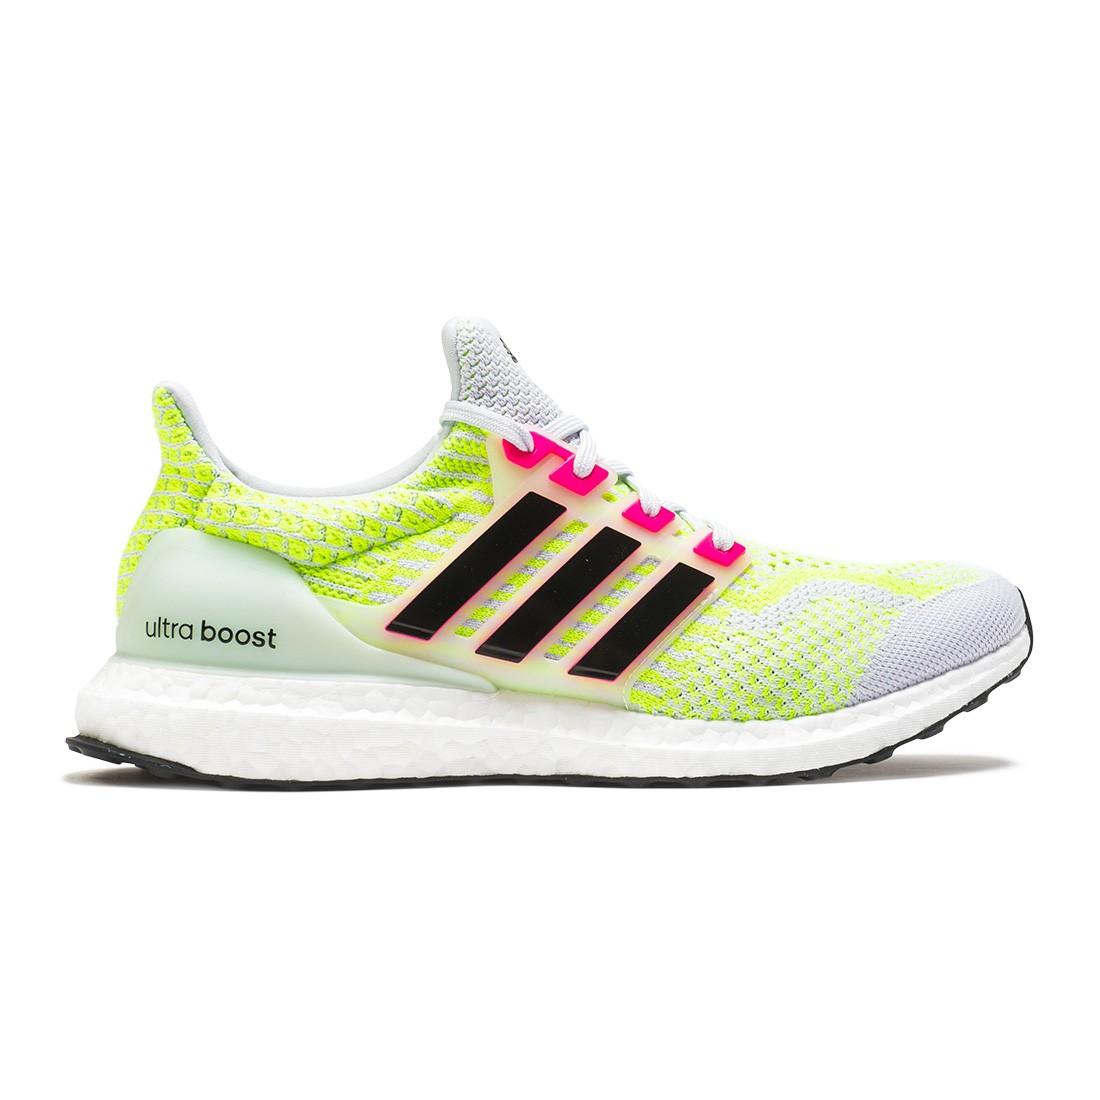 Adidas Men UltraBOOST 5.0 DNA (gray / dash grey / core black / signal green)